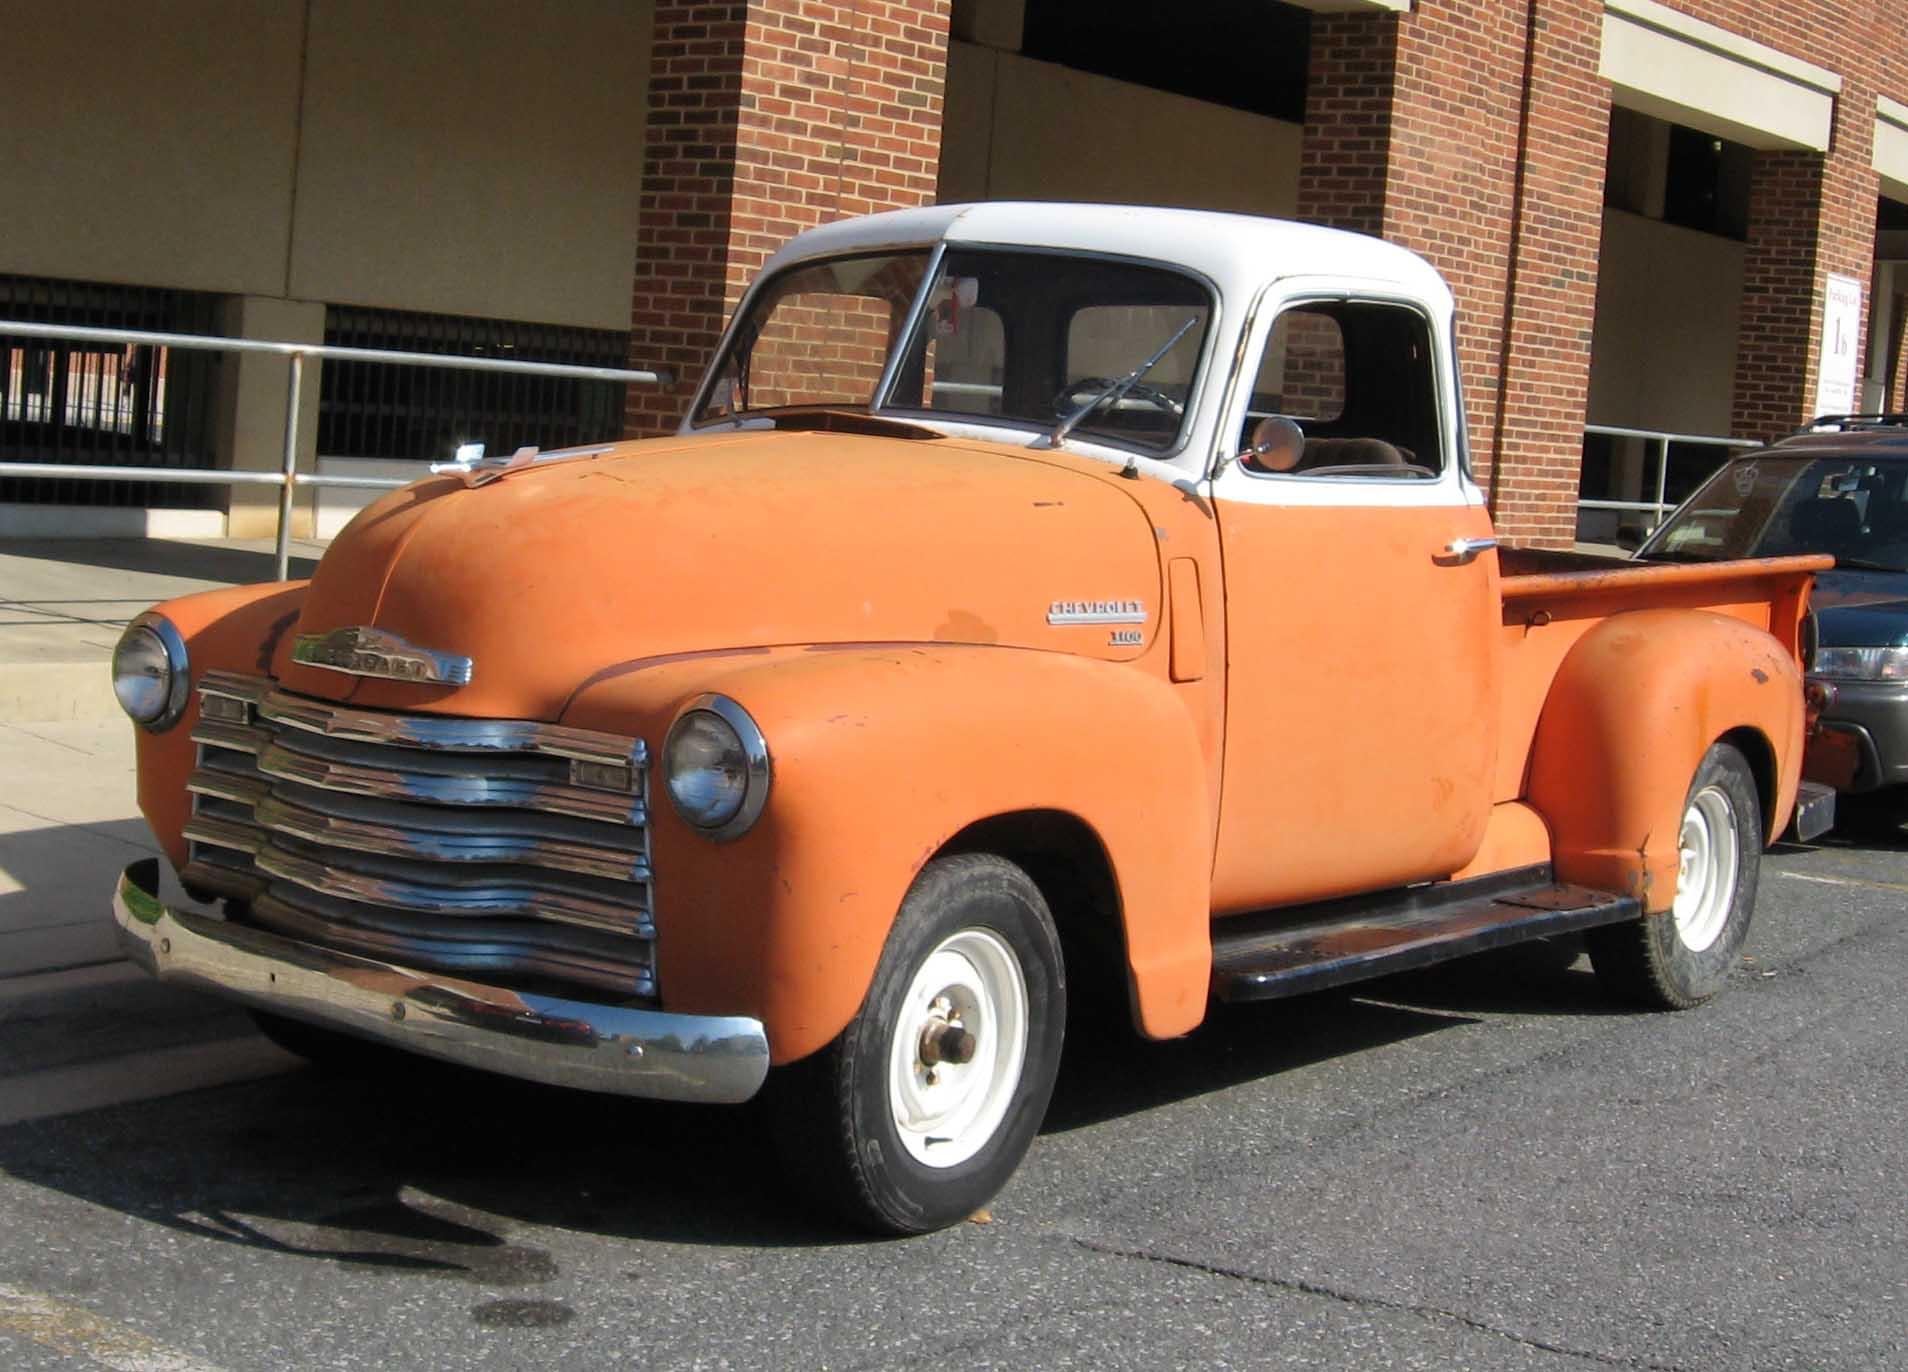 Image Result For Old Pickup Truck